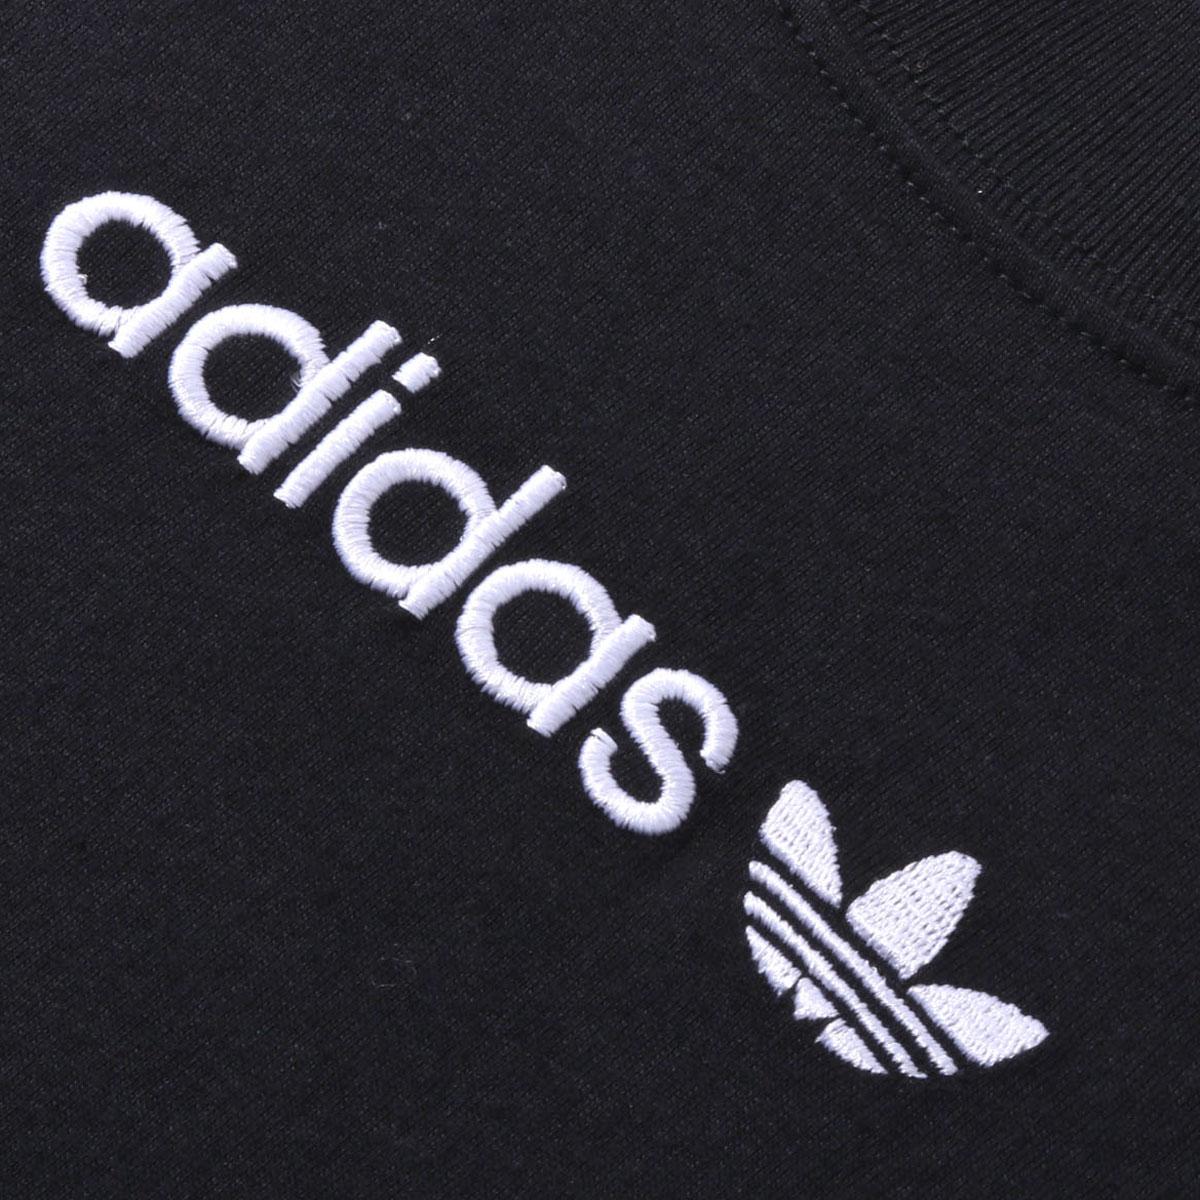 ee9703bdda ... adidas Originals COEEZE LS TEE (BLACK) (Adidas originals COEEZE LS tea)  ...